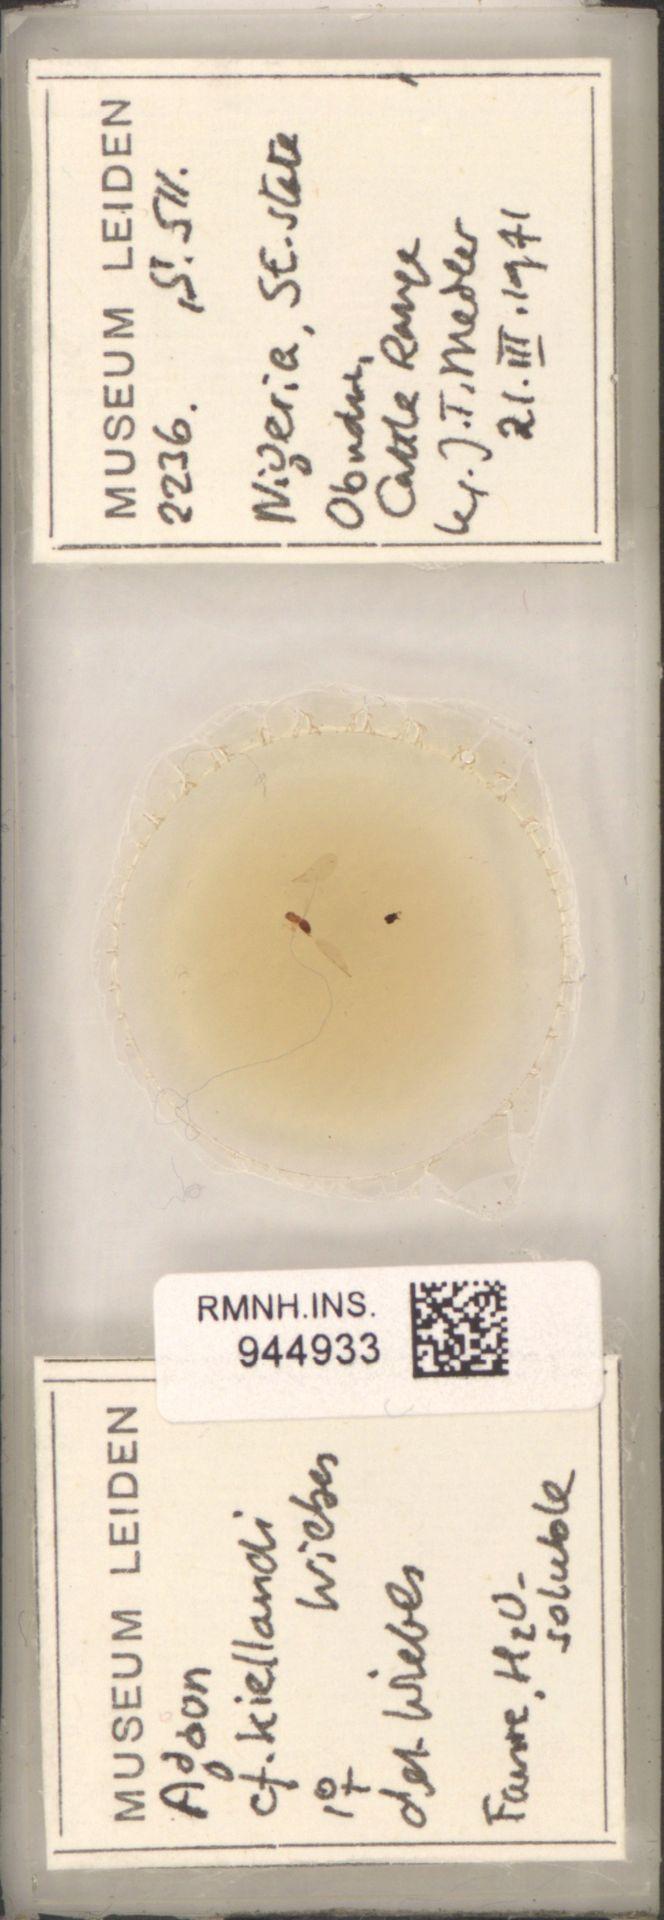 RMNH.INS.944933   Agaon kiellandi Wiebes